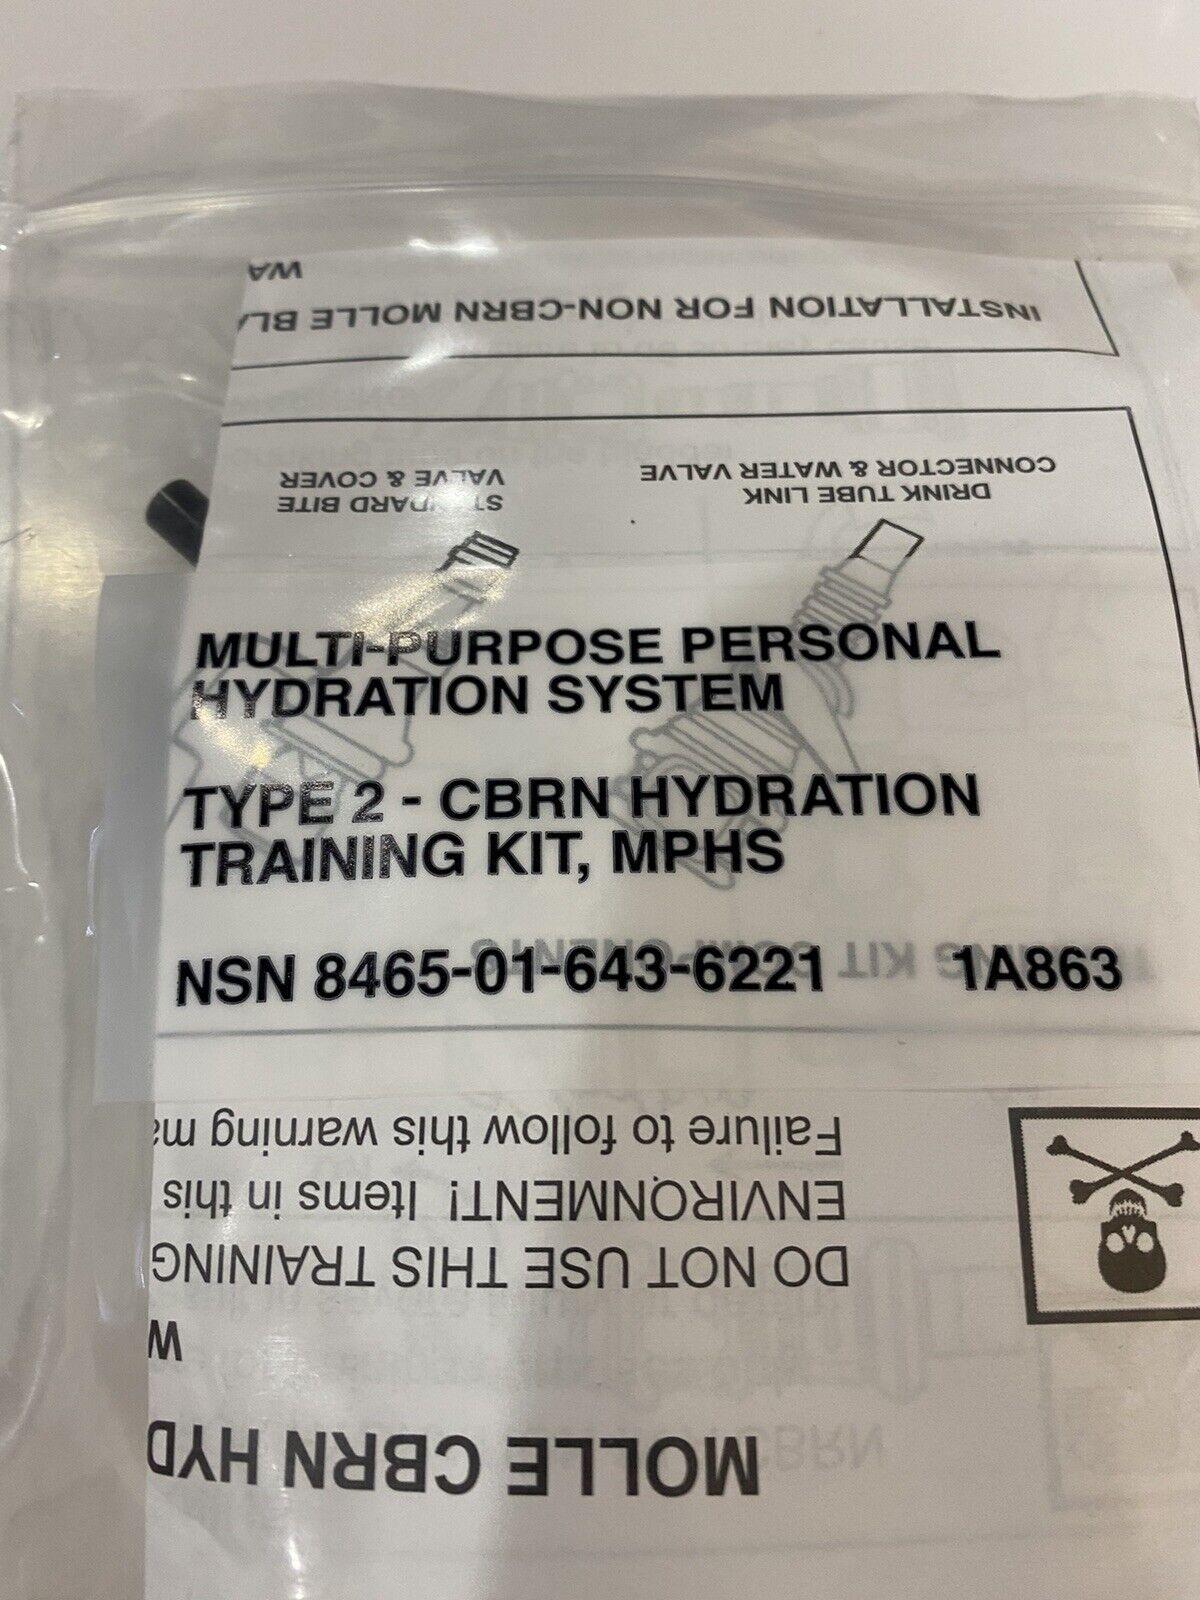 Camelbak Hydrolink Umbausatz W Blase Biss Ventil Hydration Adapter Cbrn